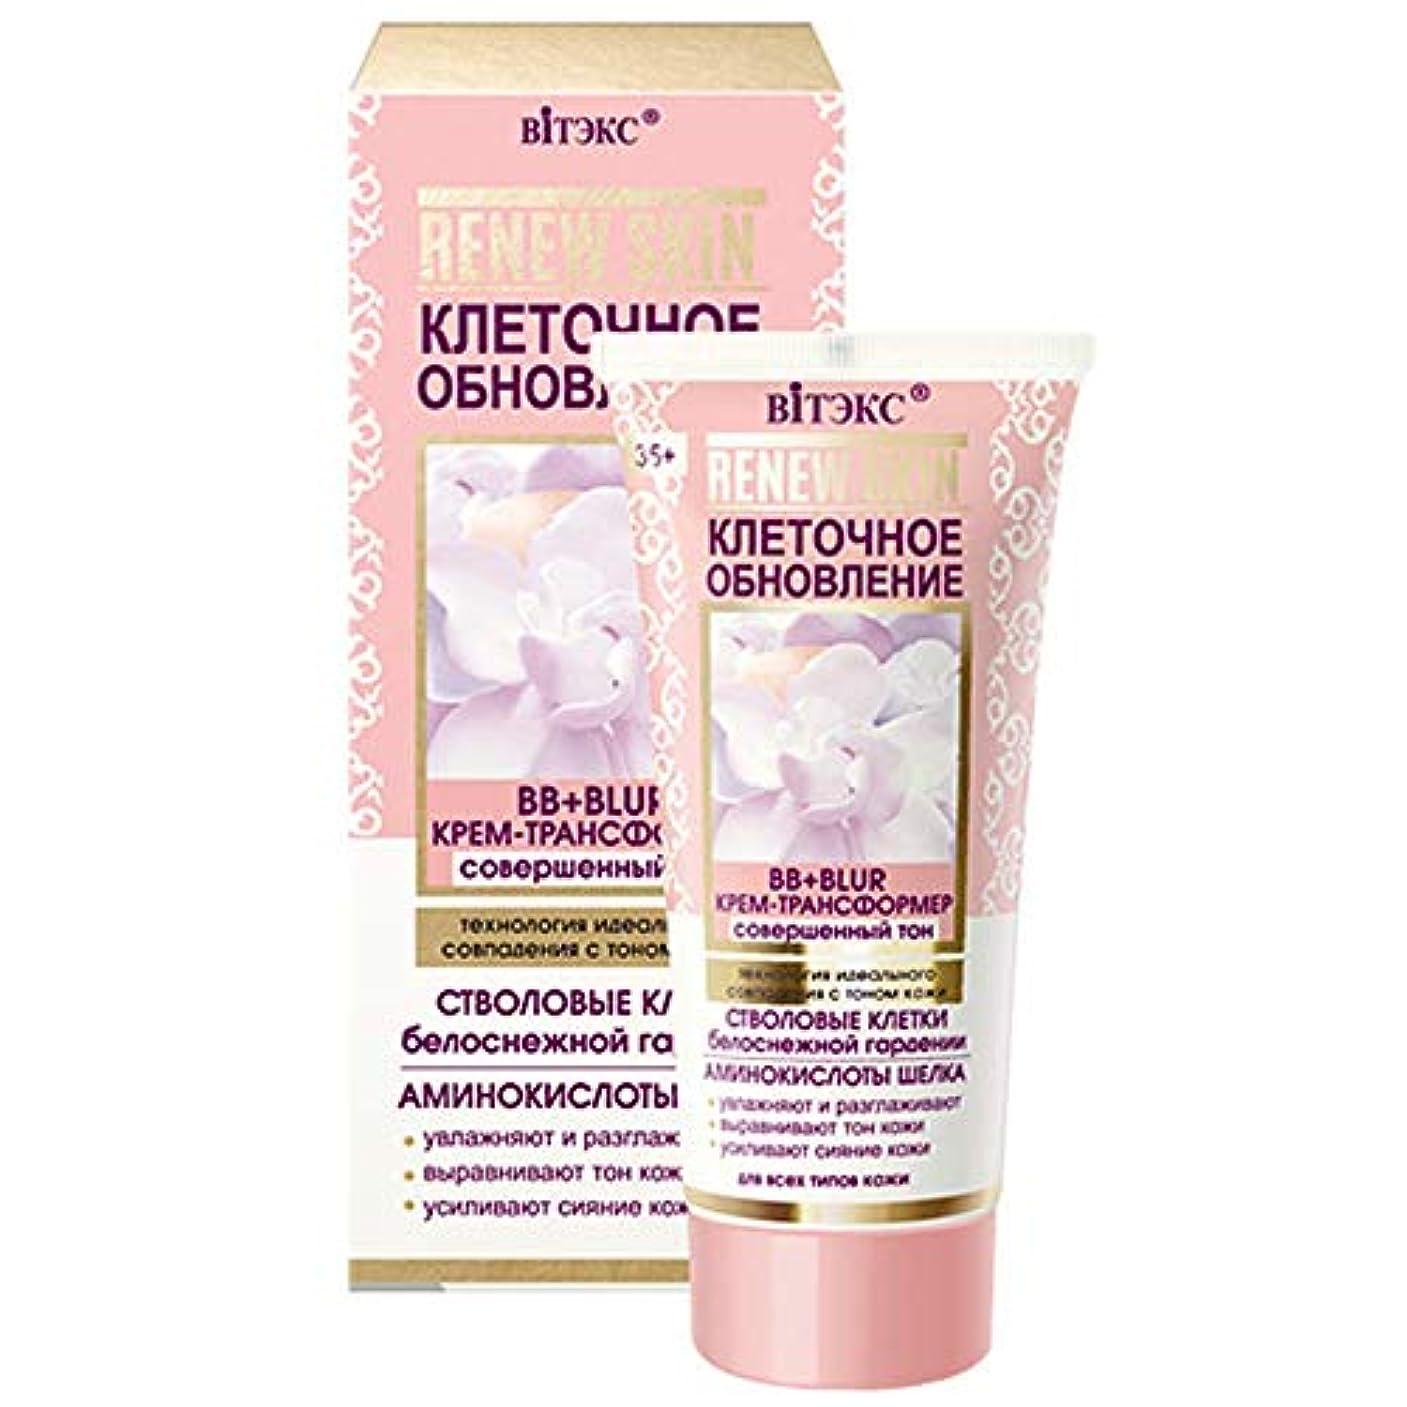 囚人毎日作成者Bielita & Vitex | RENEW SKIN | BB + BLUR CREAM-TRANSFORMER | Perfect tone technology of perfect match with skin...